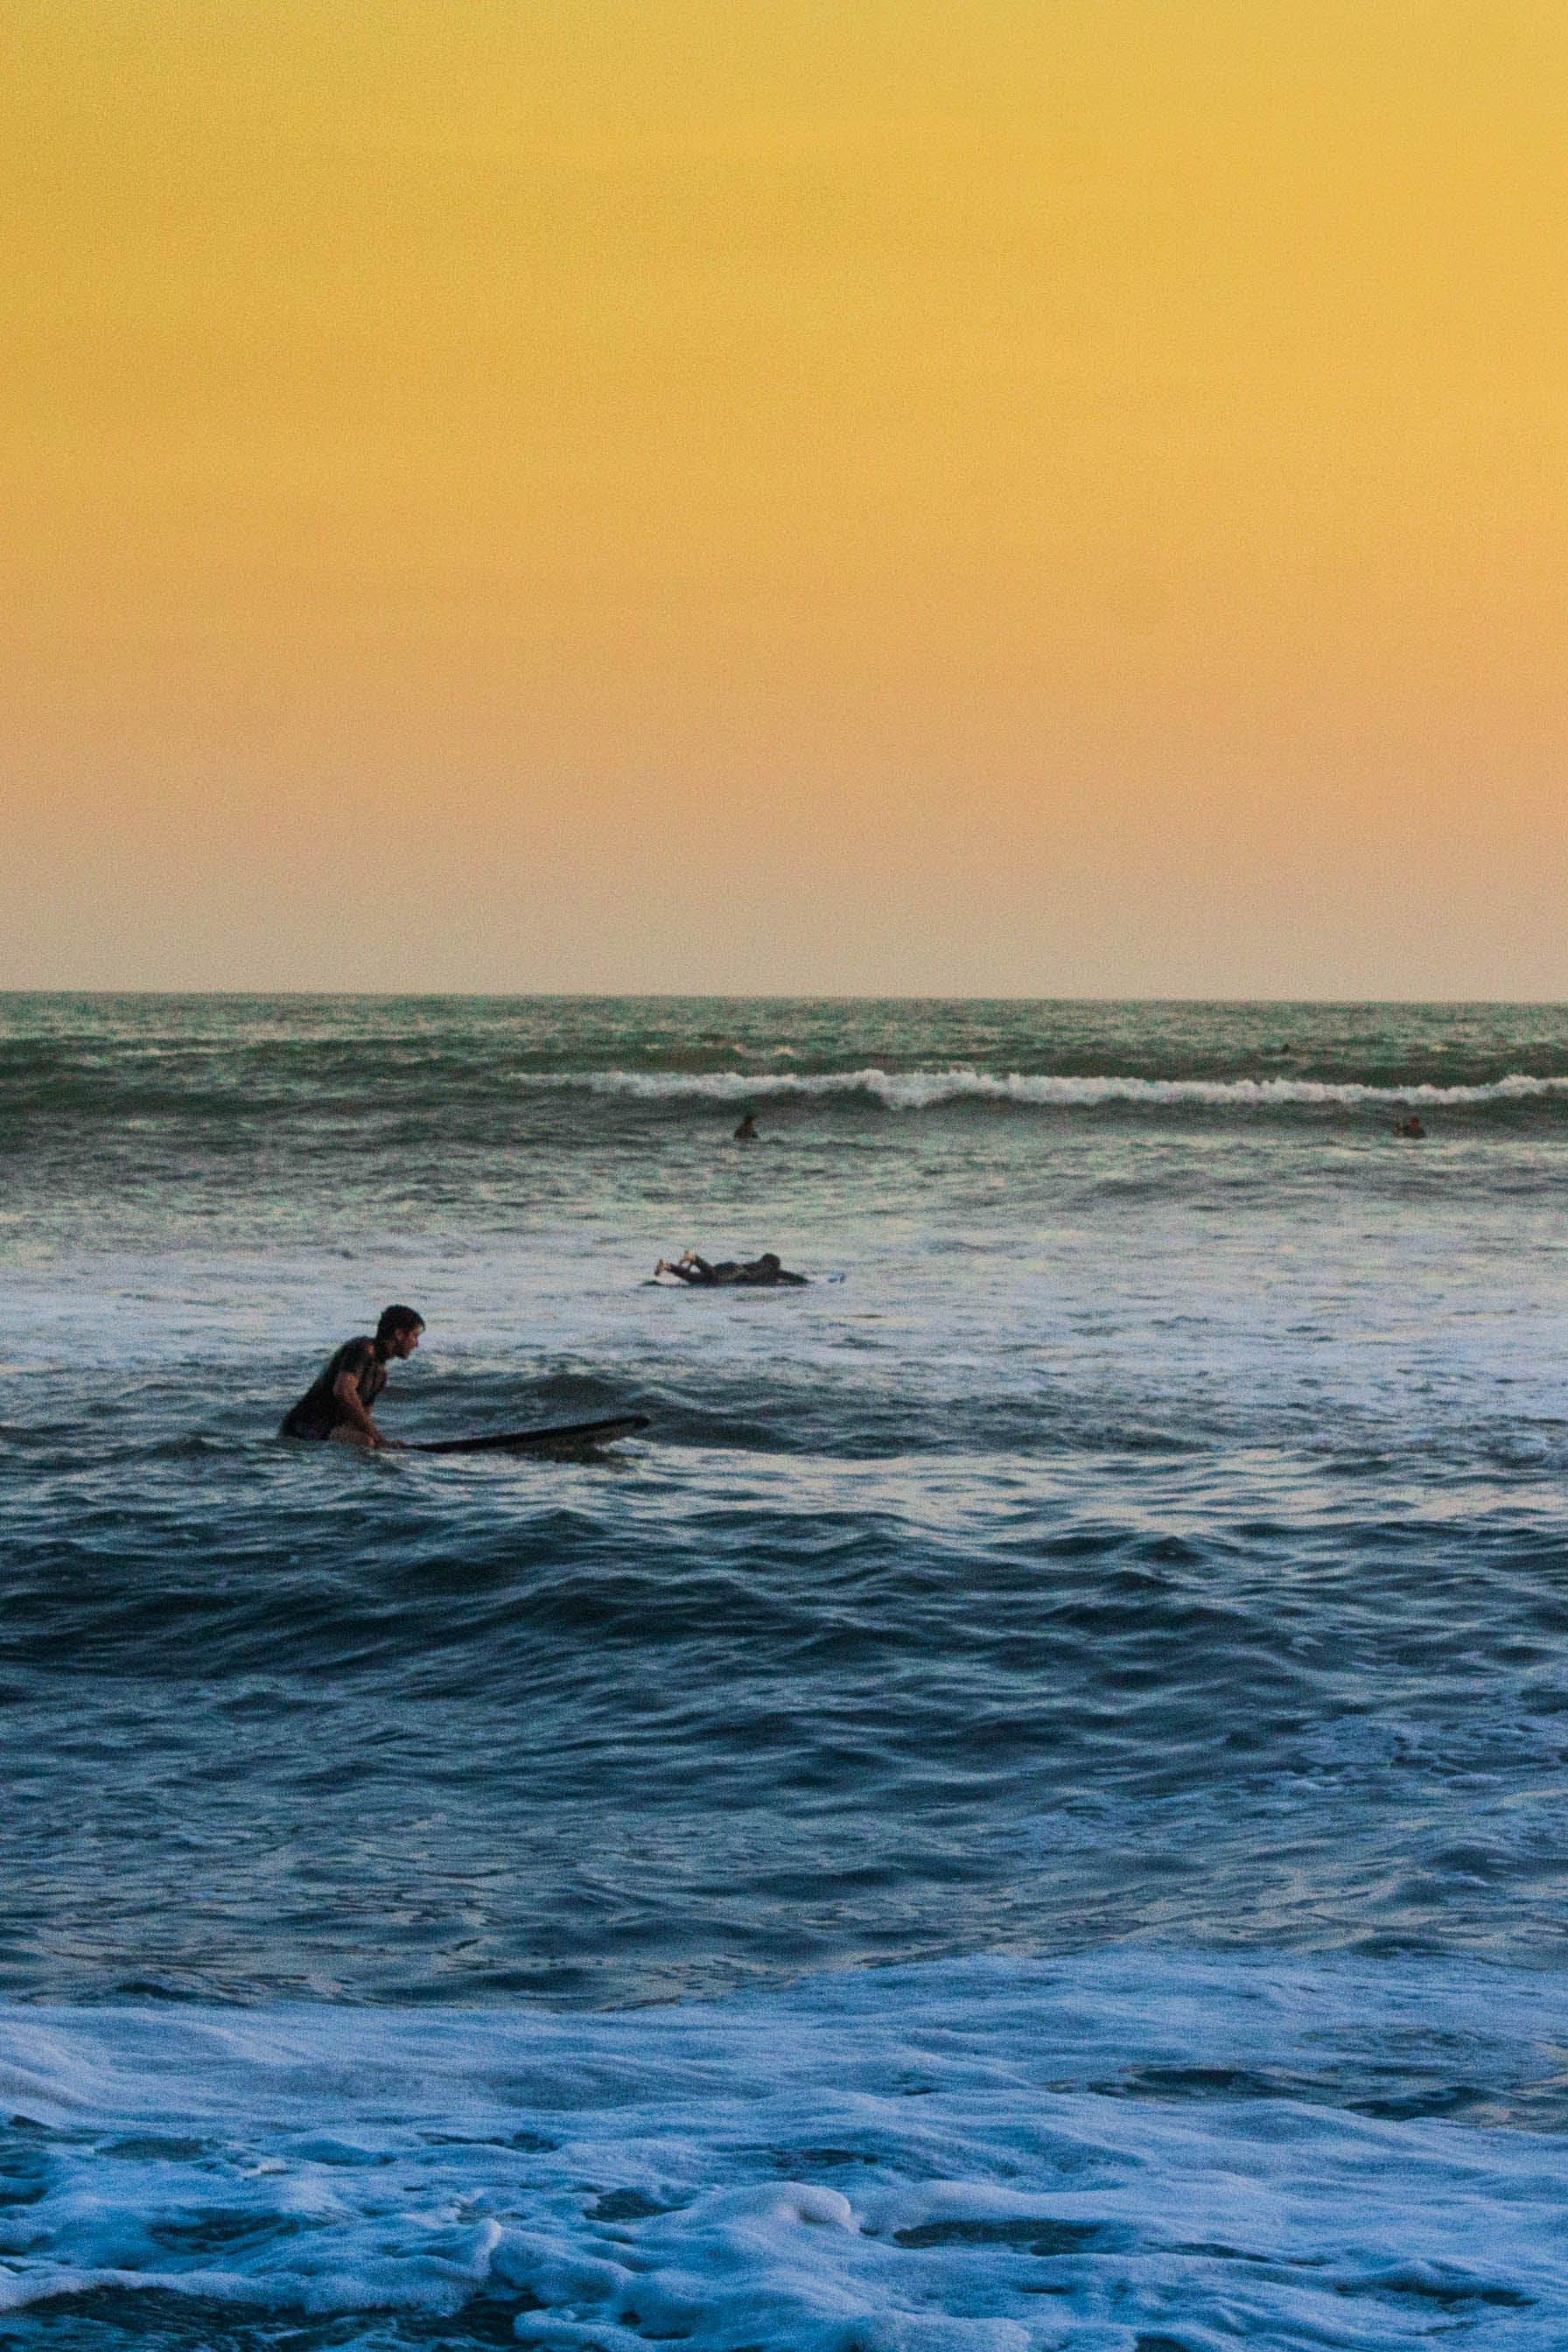 Man Swimming on Sea Under Yellow Sky